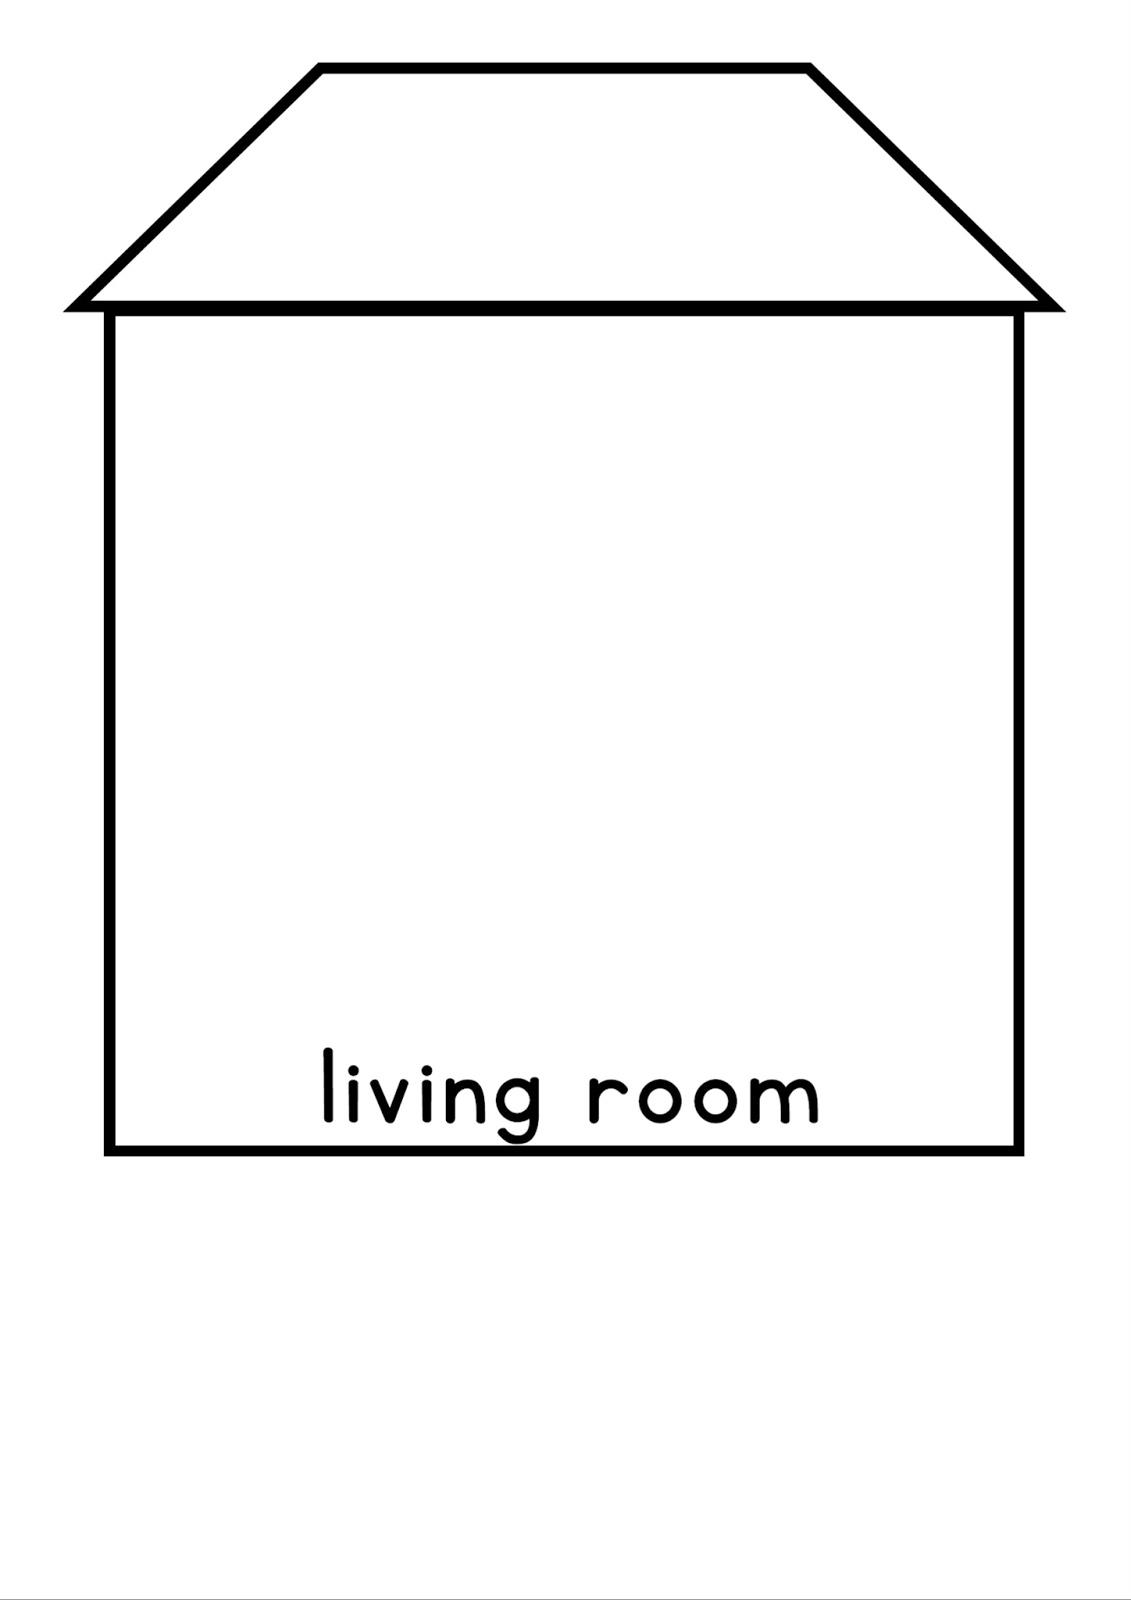 teacherfiera.com: MY HOUSE FLIP BOOK TEMPLATE (YEAR 2 UNIT 6)